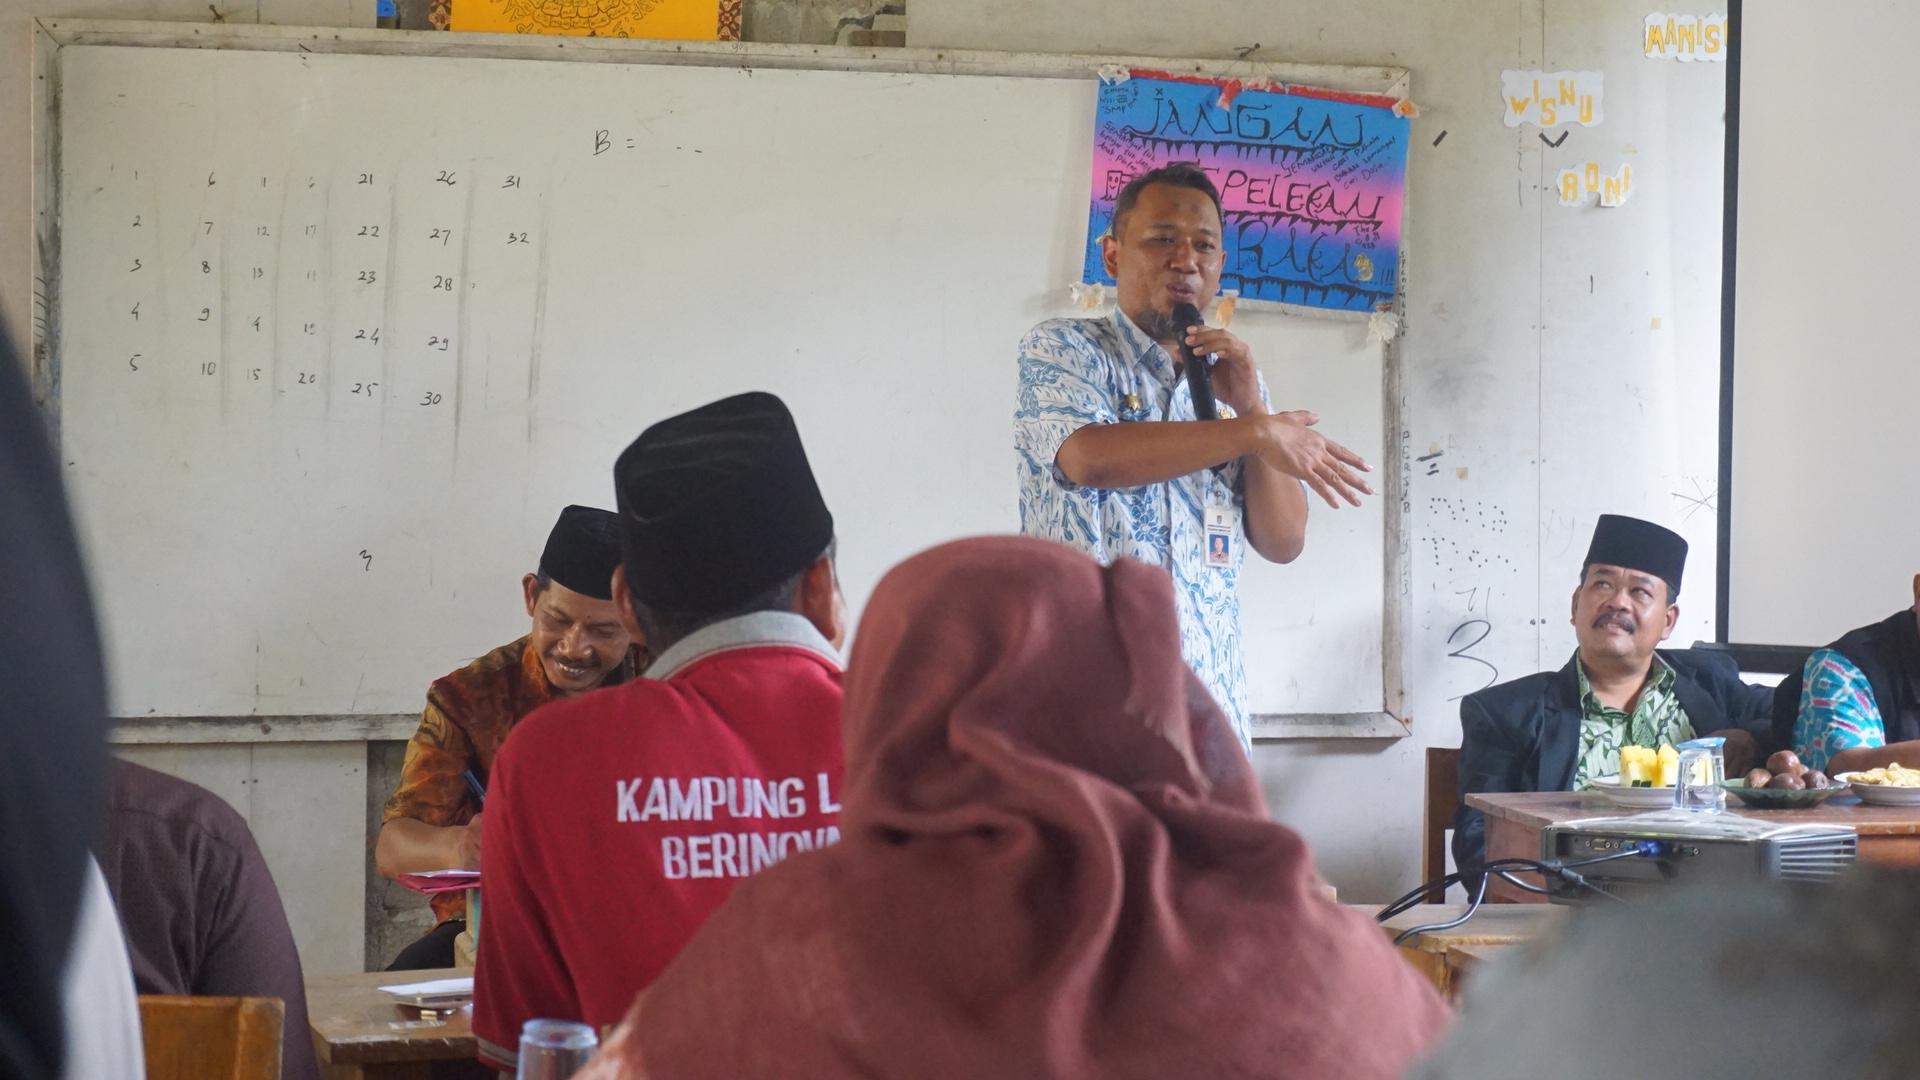 Kampung Laut Tempat Refleksi Ksp Region Jawa Bina Desa Camat